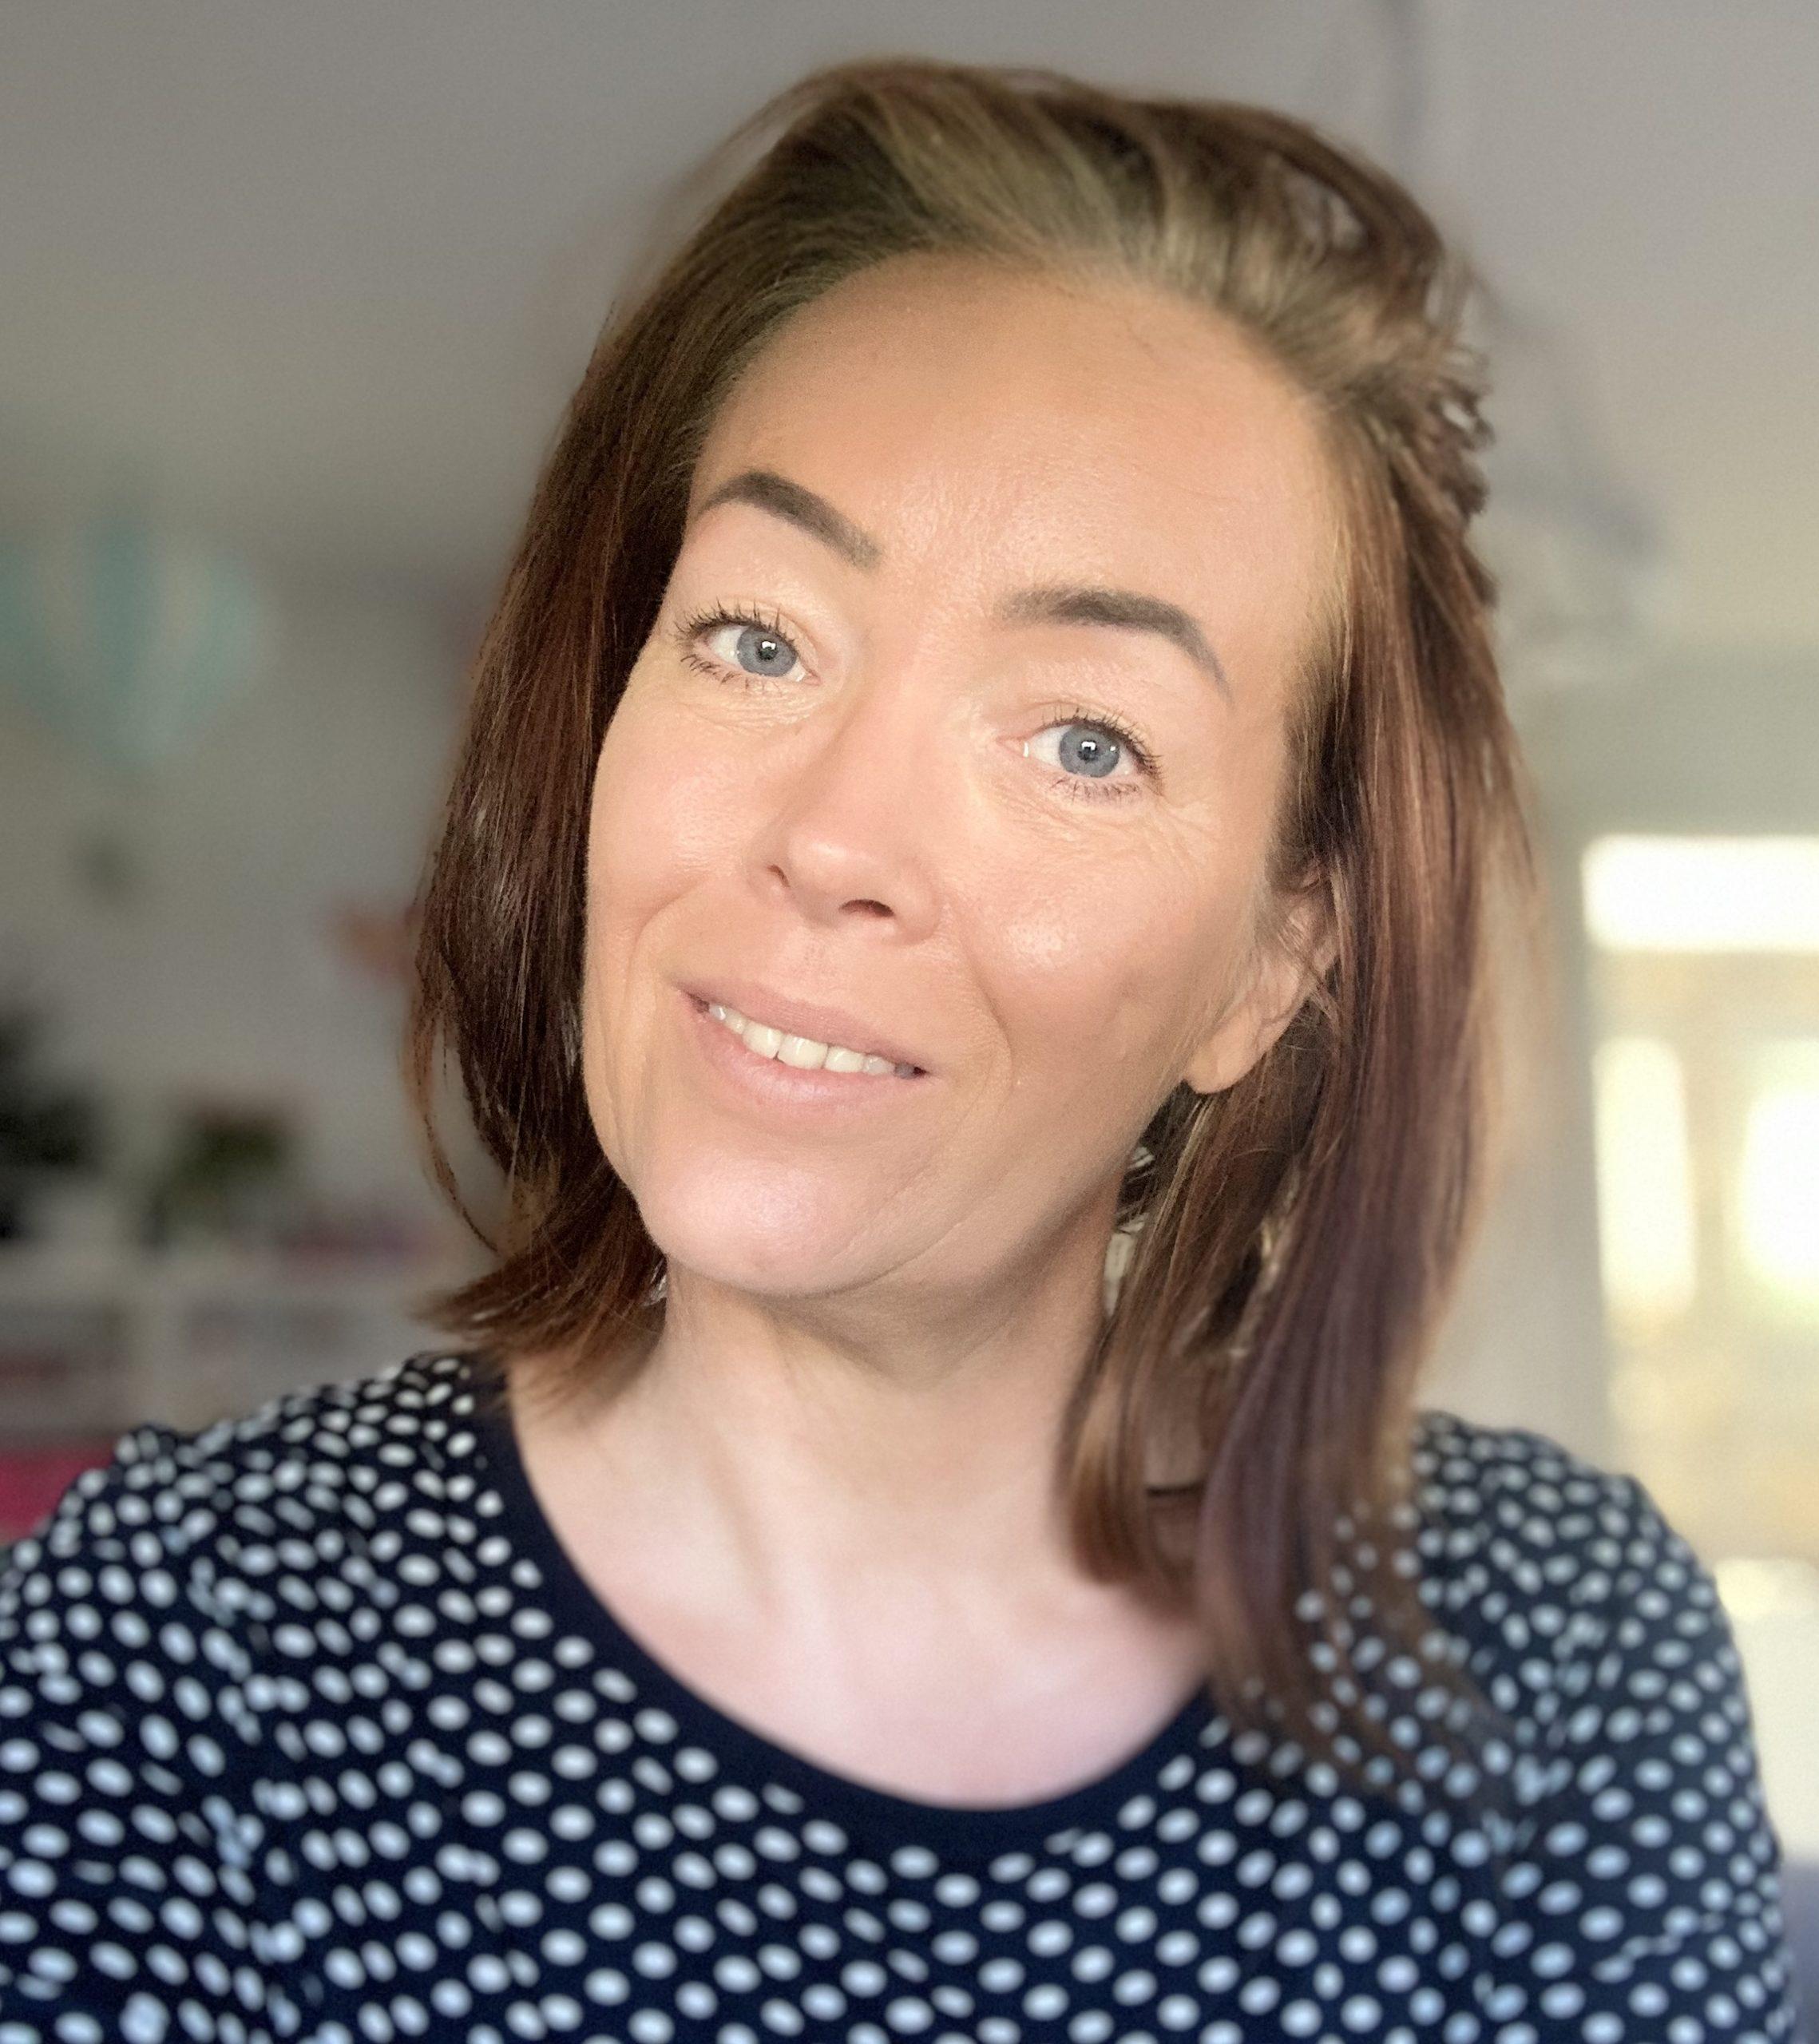 Mari Törnkvist lider av lera andra autoimmuna sjukdomar